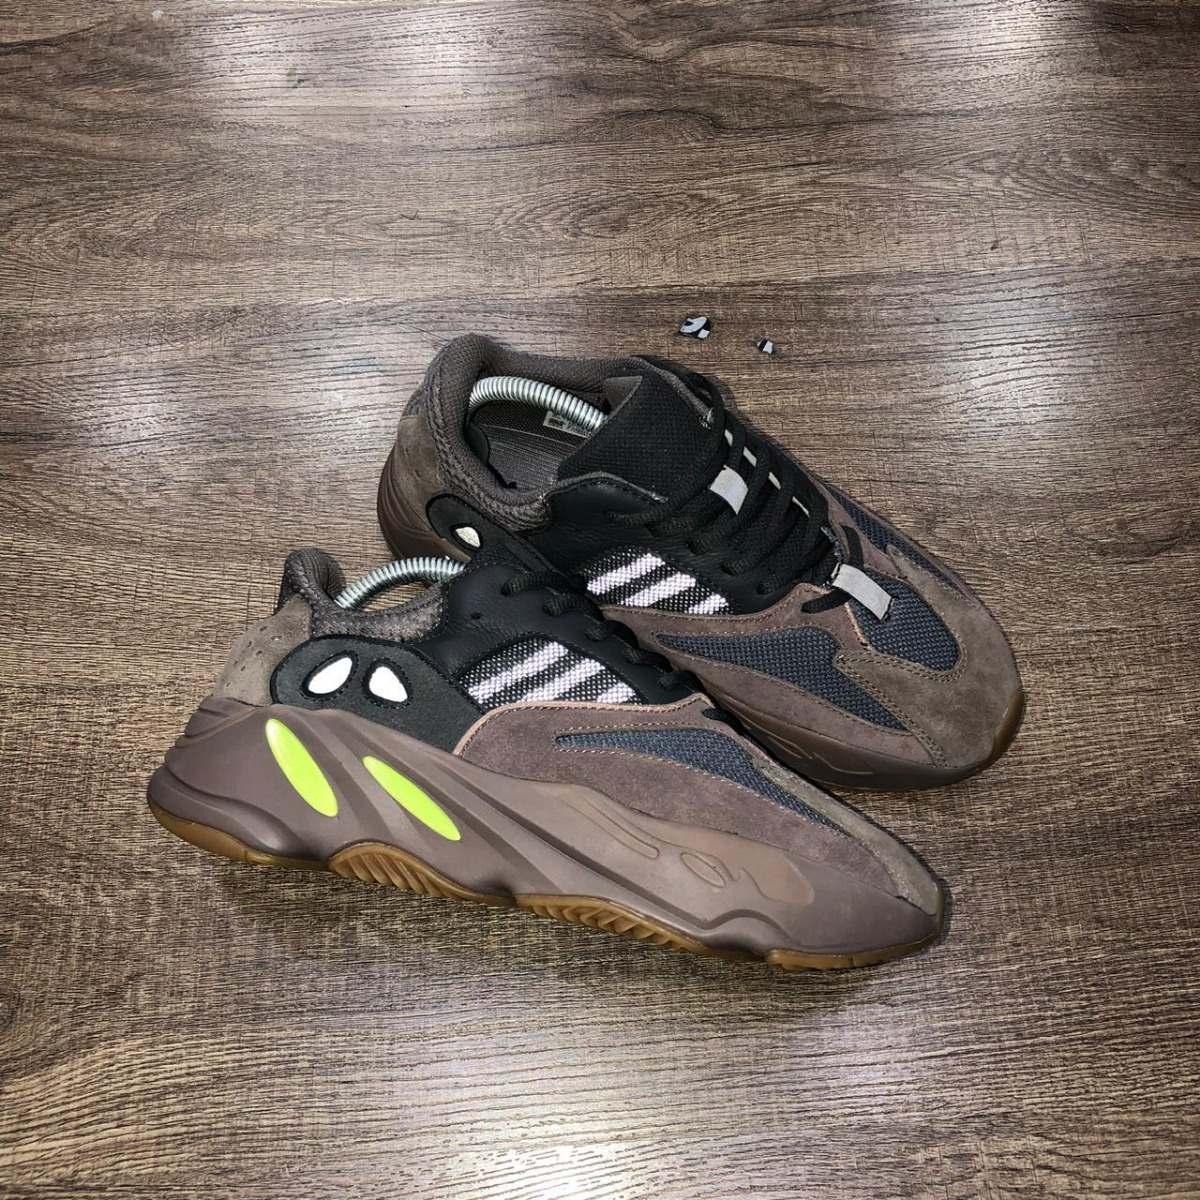 d515159afc17 Tênis adidas Yeezy Boost 700 Mauve - R  1.650